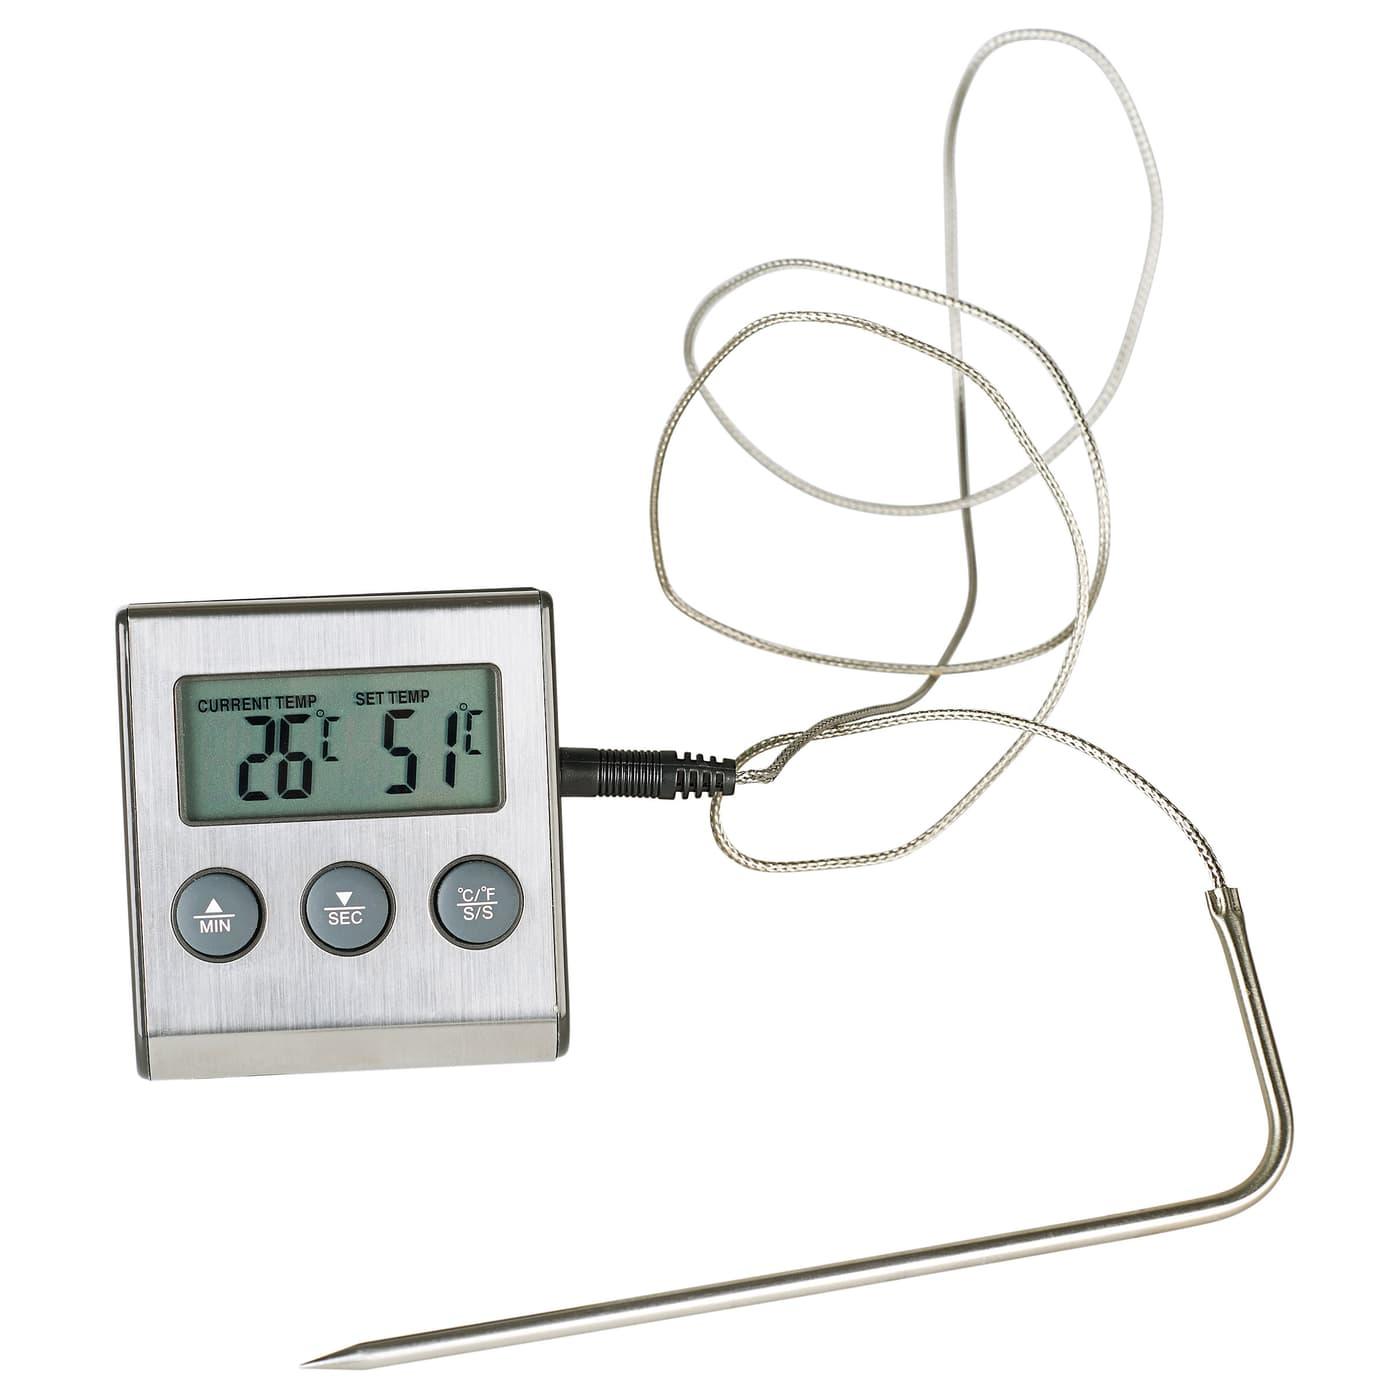 cucina tavola c t bratenthermometer mit f hler migros. Black Bedroom Furniture Sets. Home Design Ideas